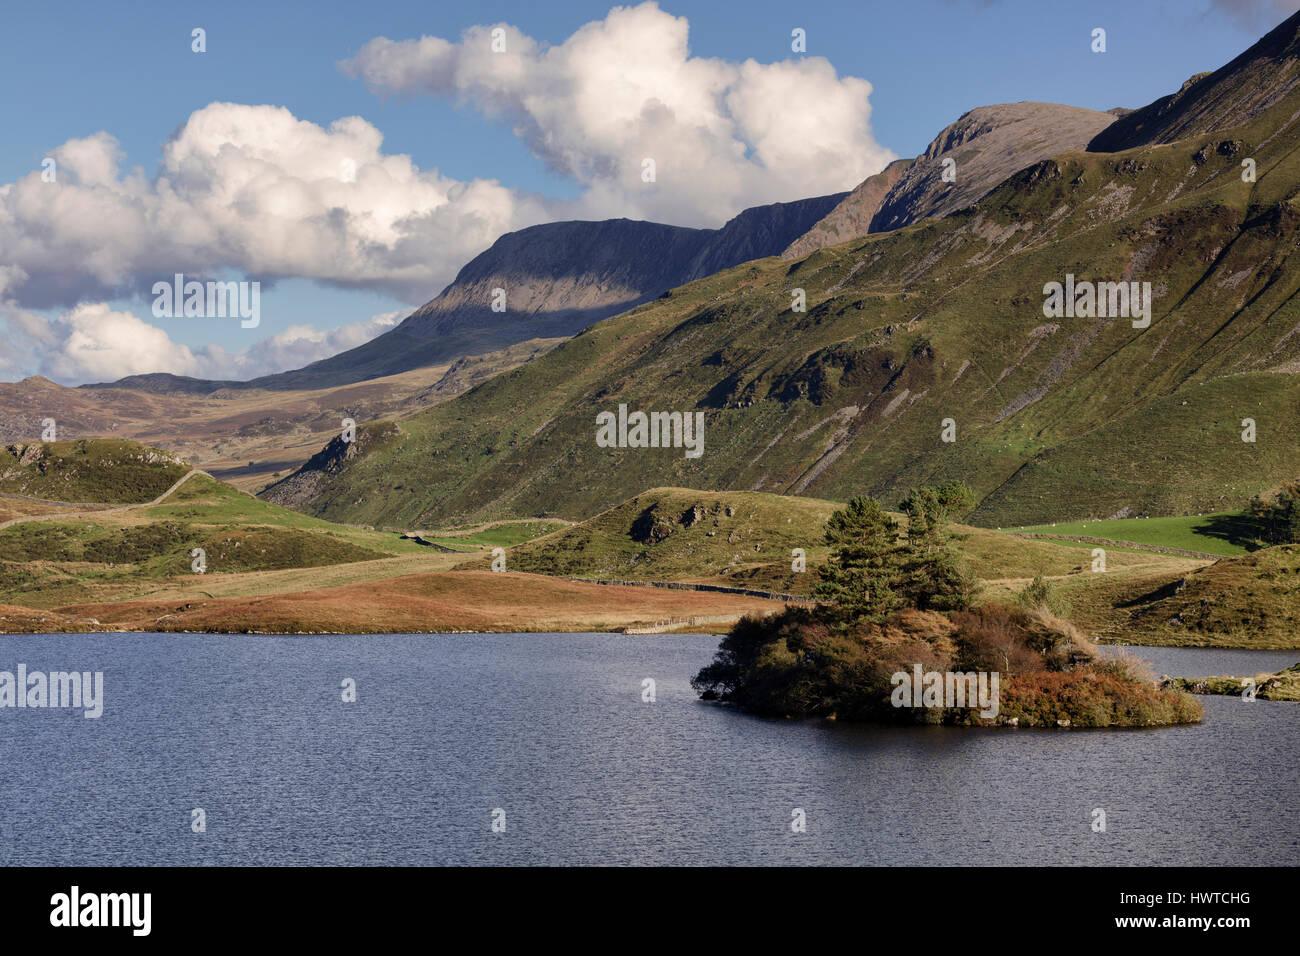 Cregennan Lakes at Cadair Idris near Dolgellau in Snowdonia in North Wales Stock Photo